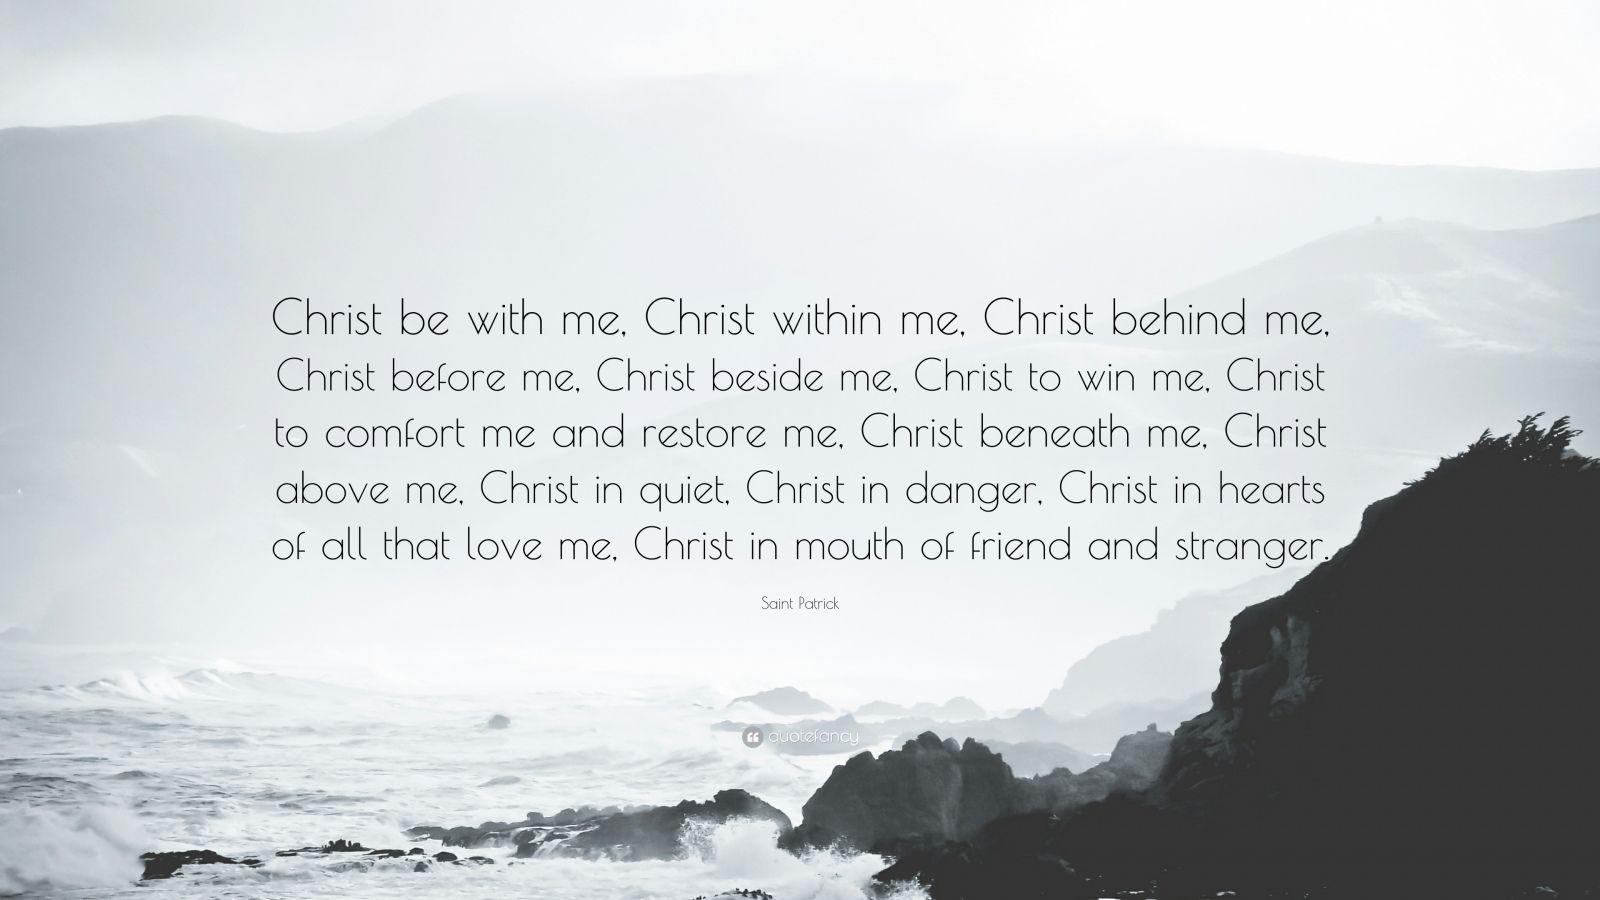 St patrick love quotes